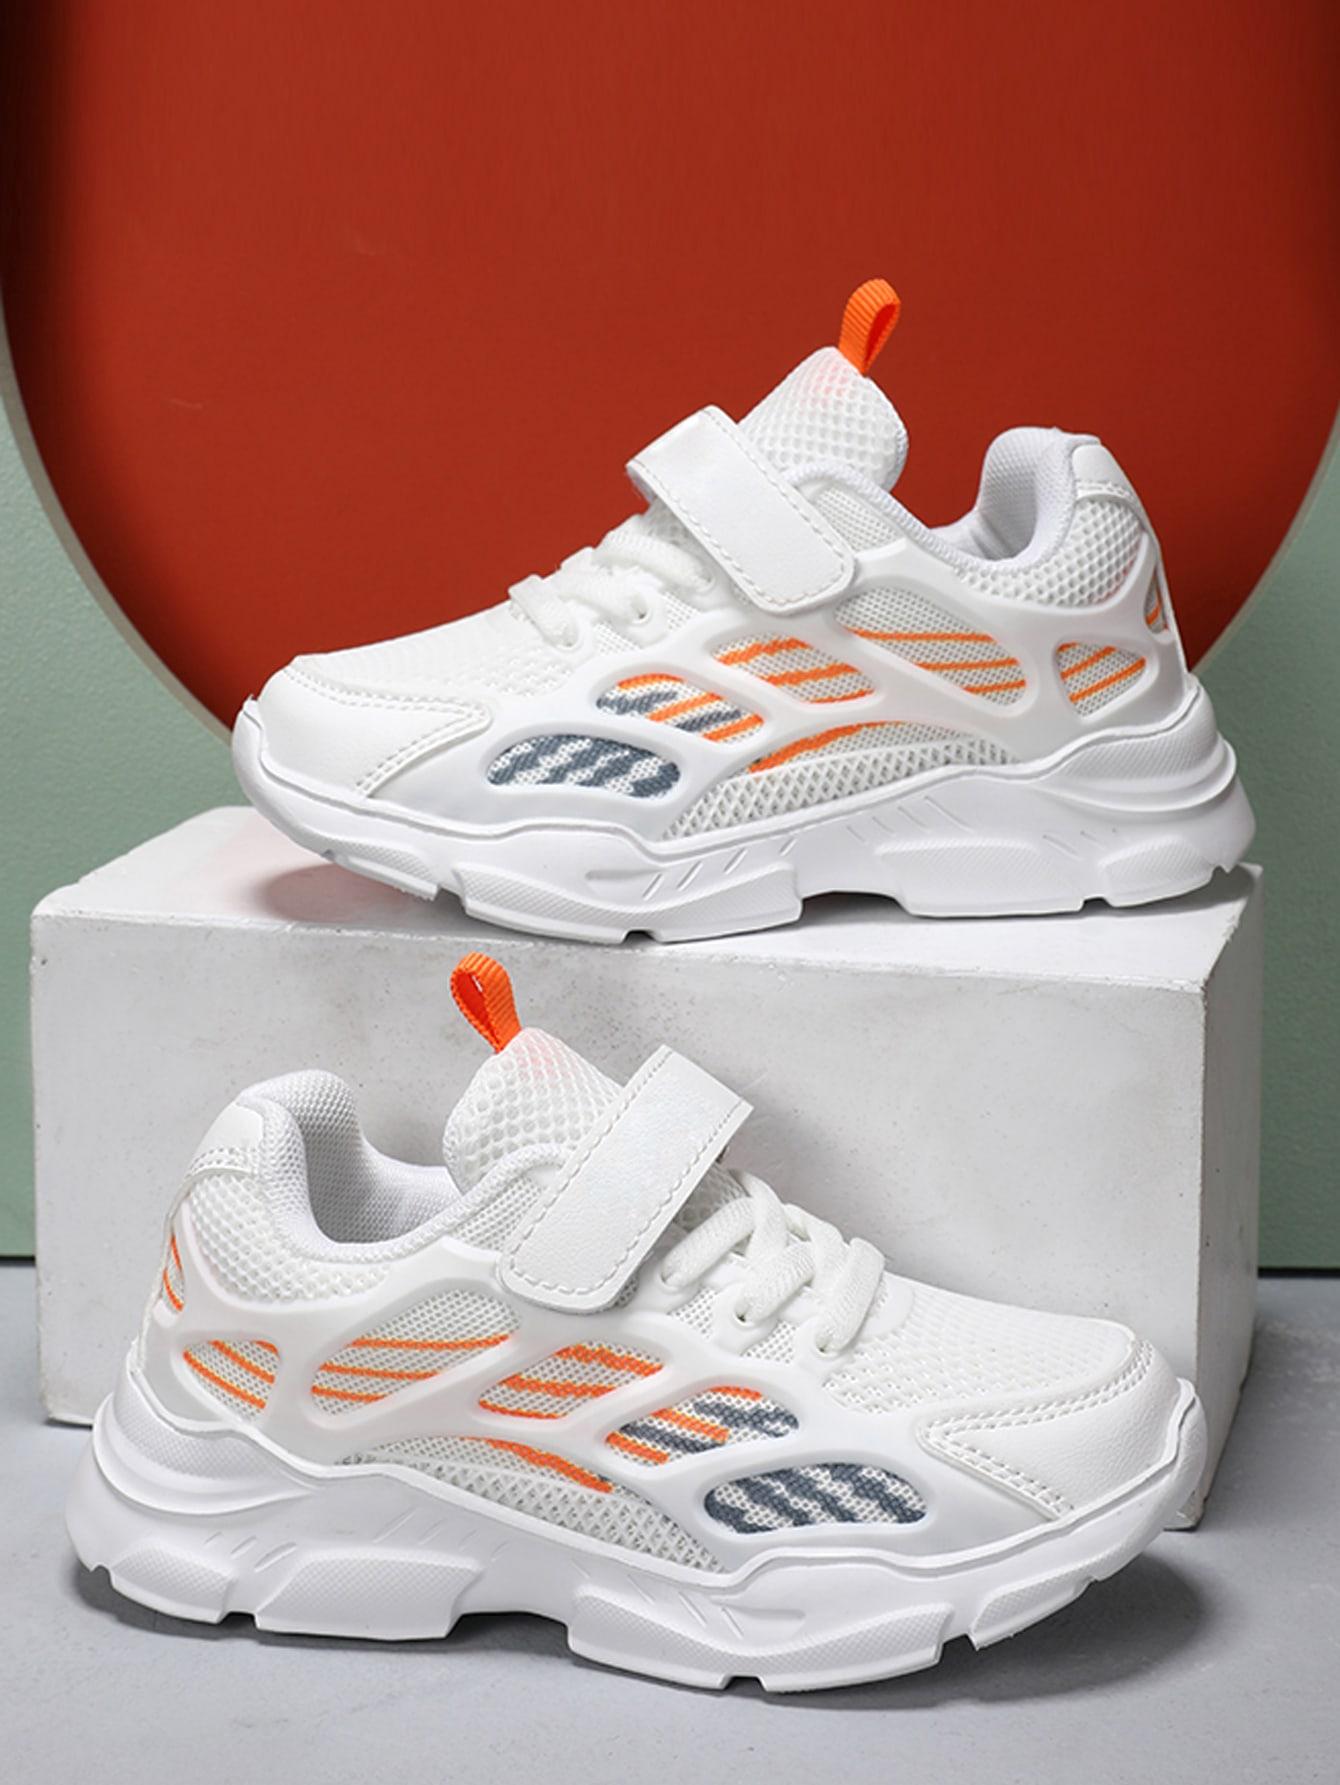 Girls Velcro Strap Sneakers